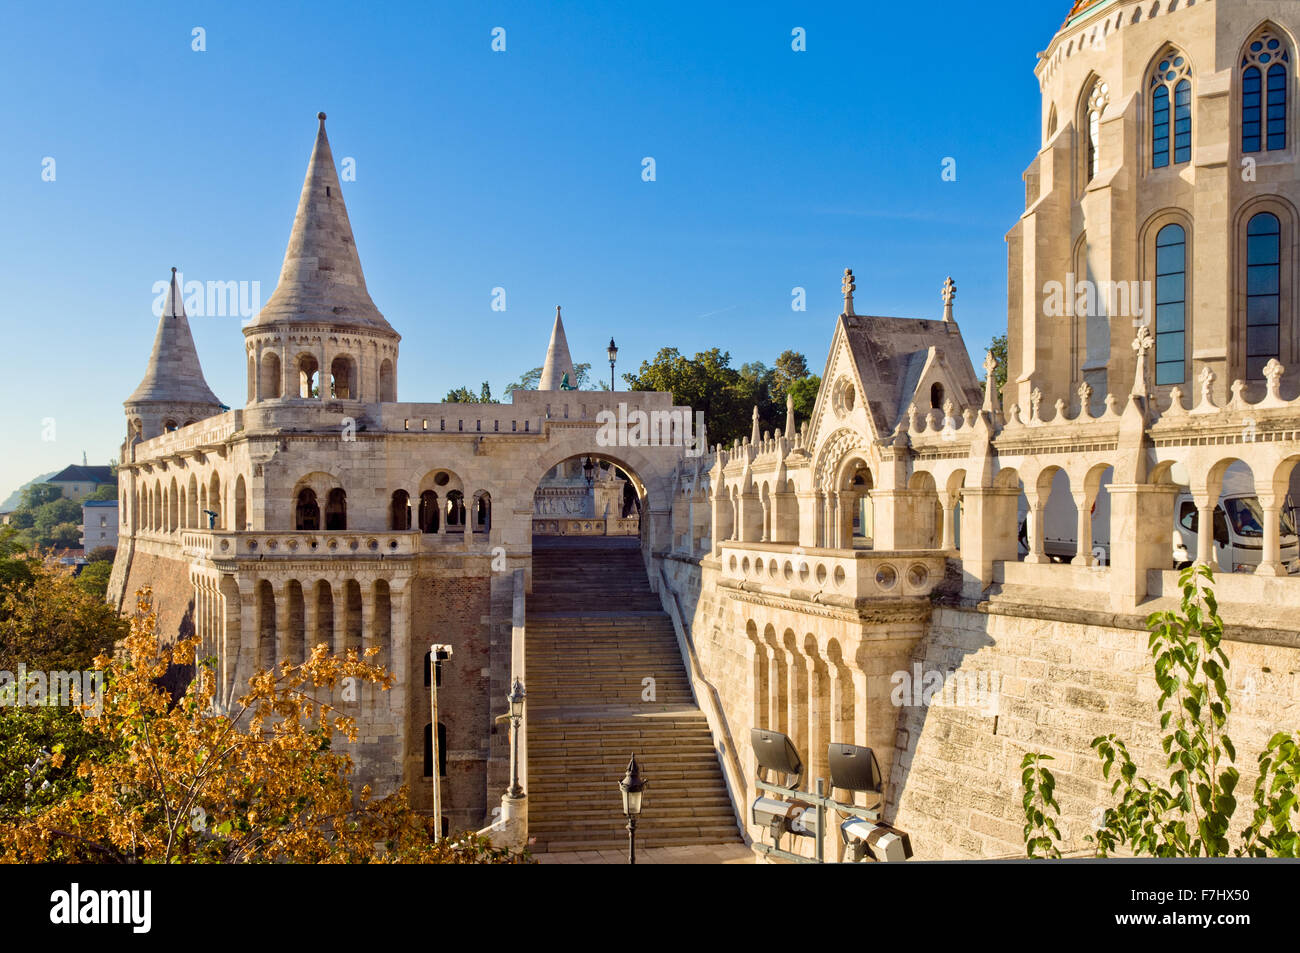 Fisherman's Bastion in Buda Castle, Budapest, Hungary - Stock Image